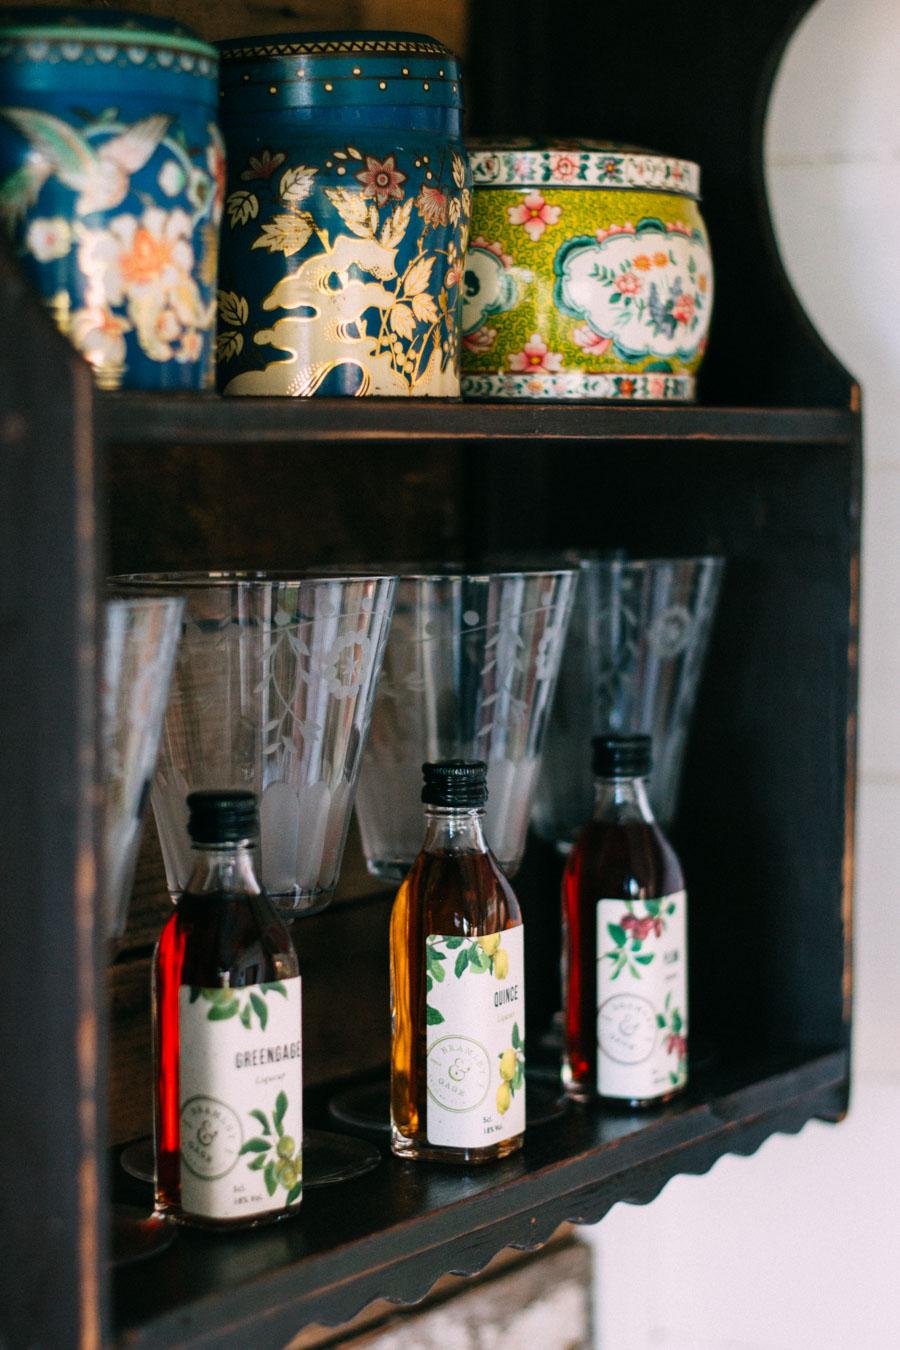 Berry Liquors